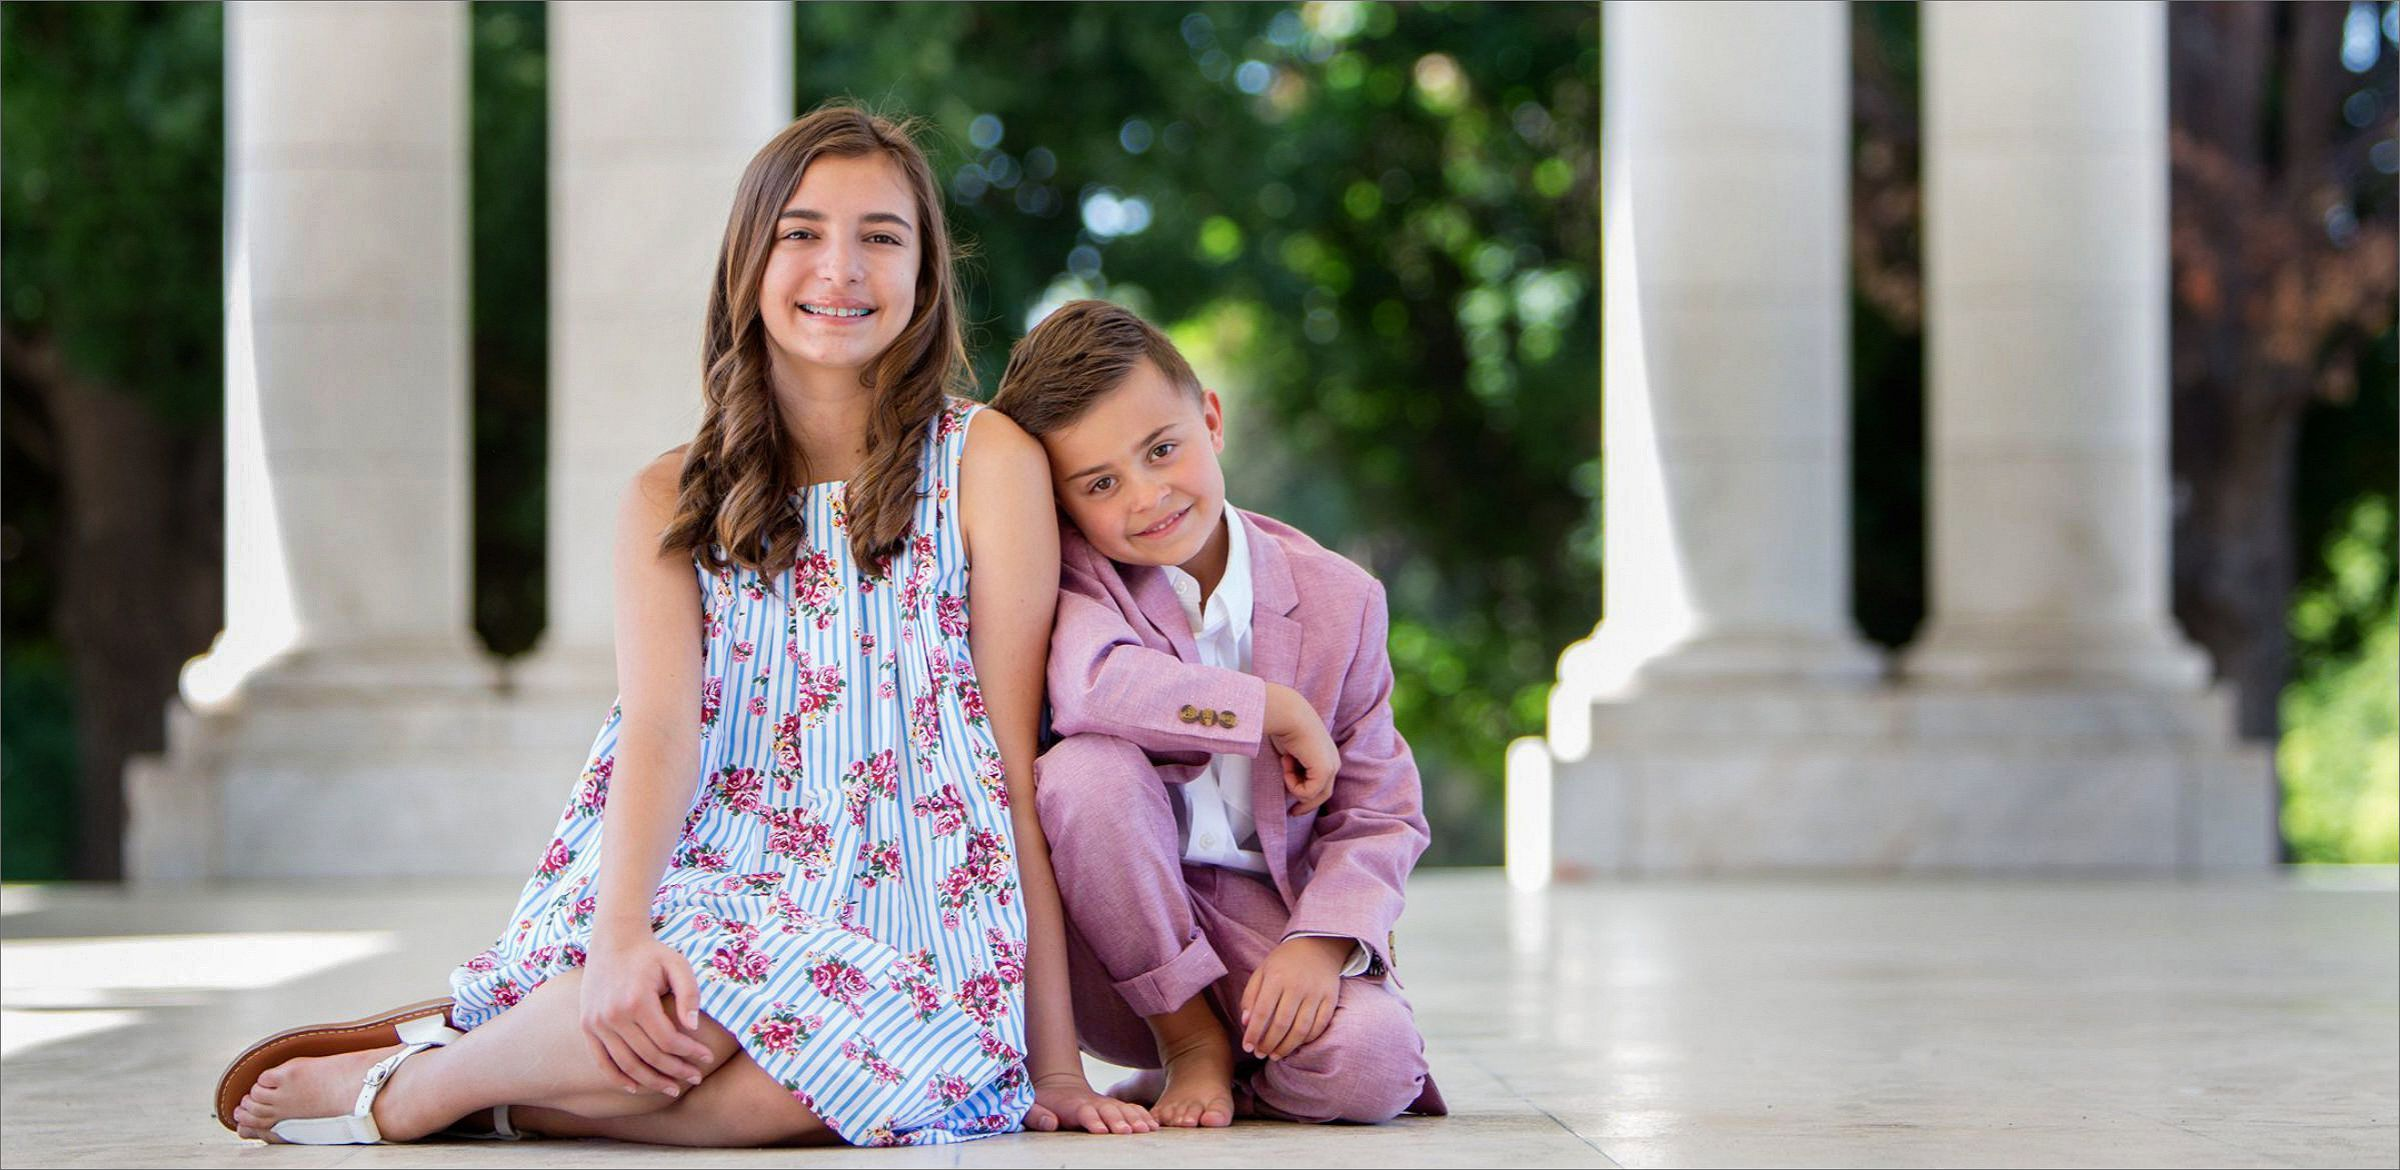 Denver Children's Photography